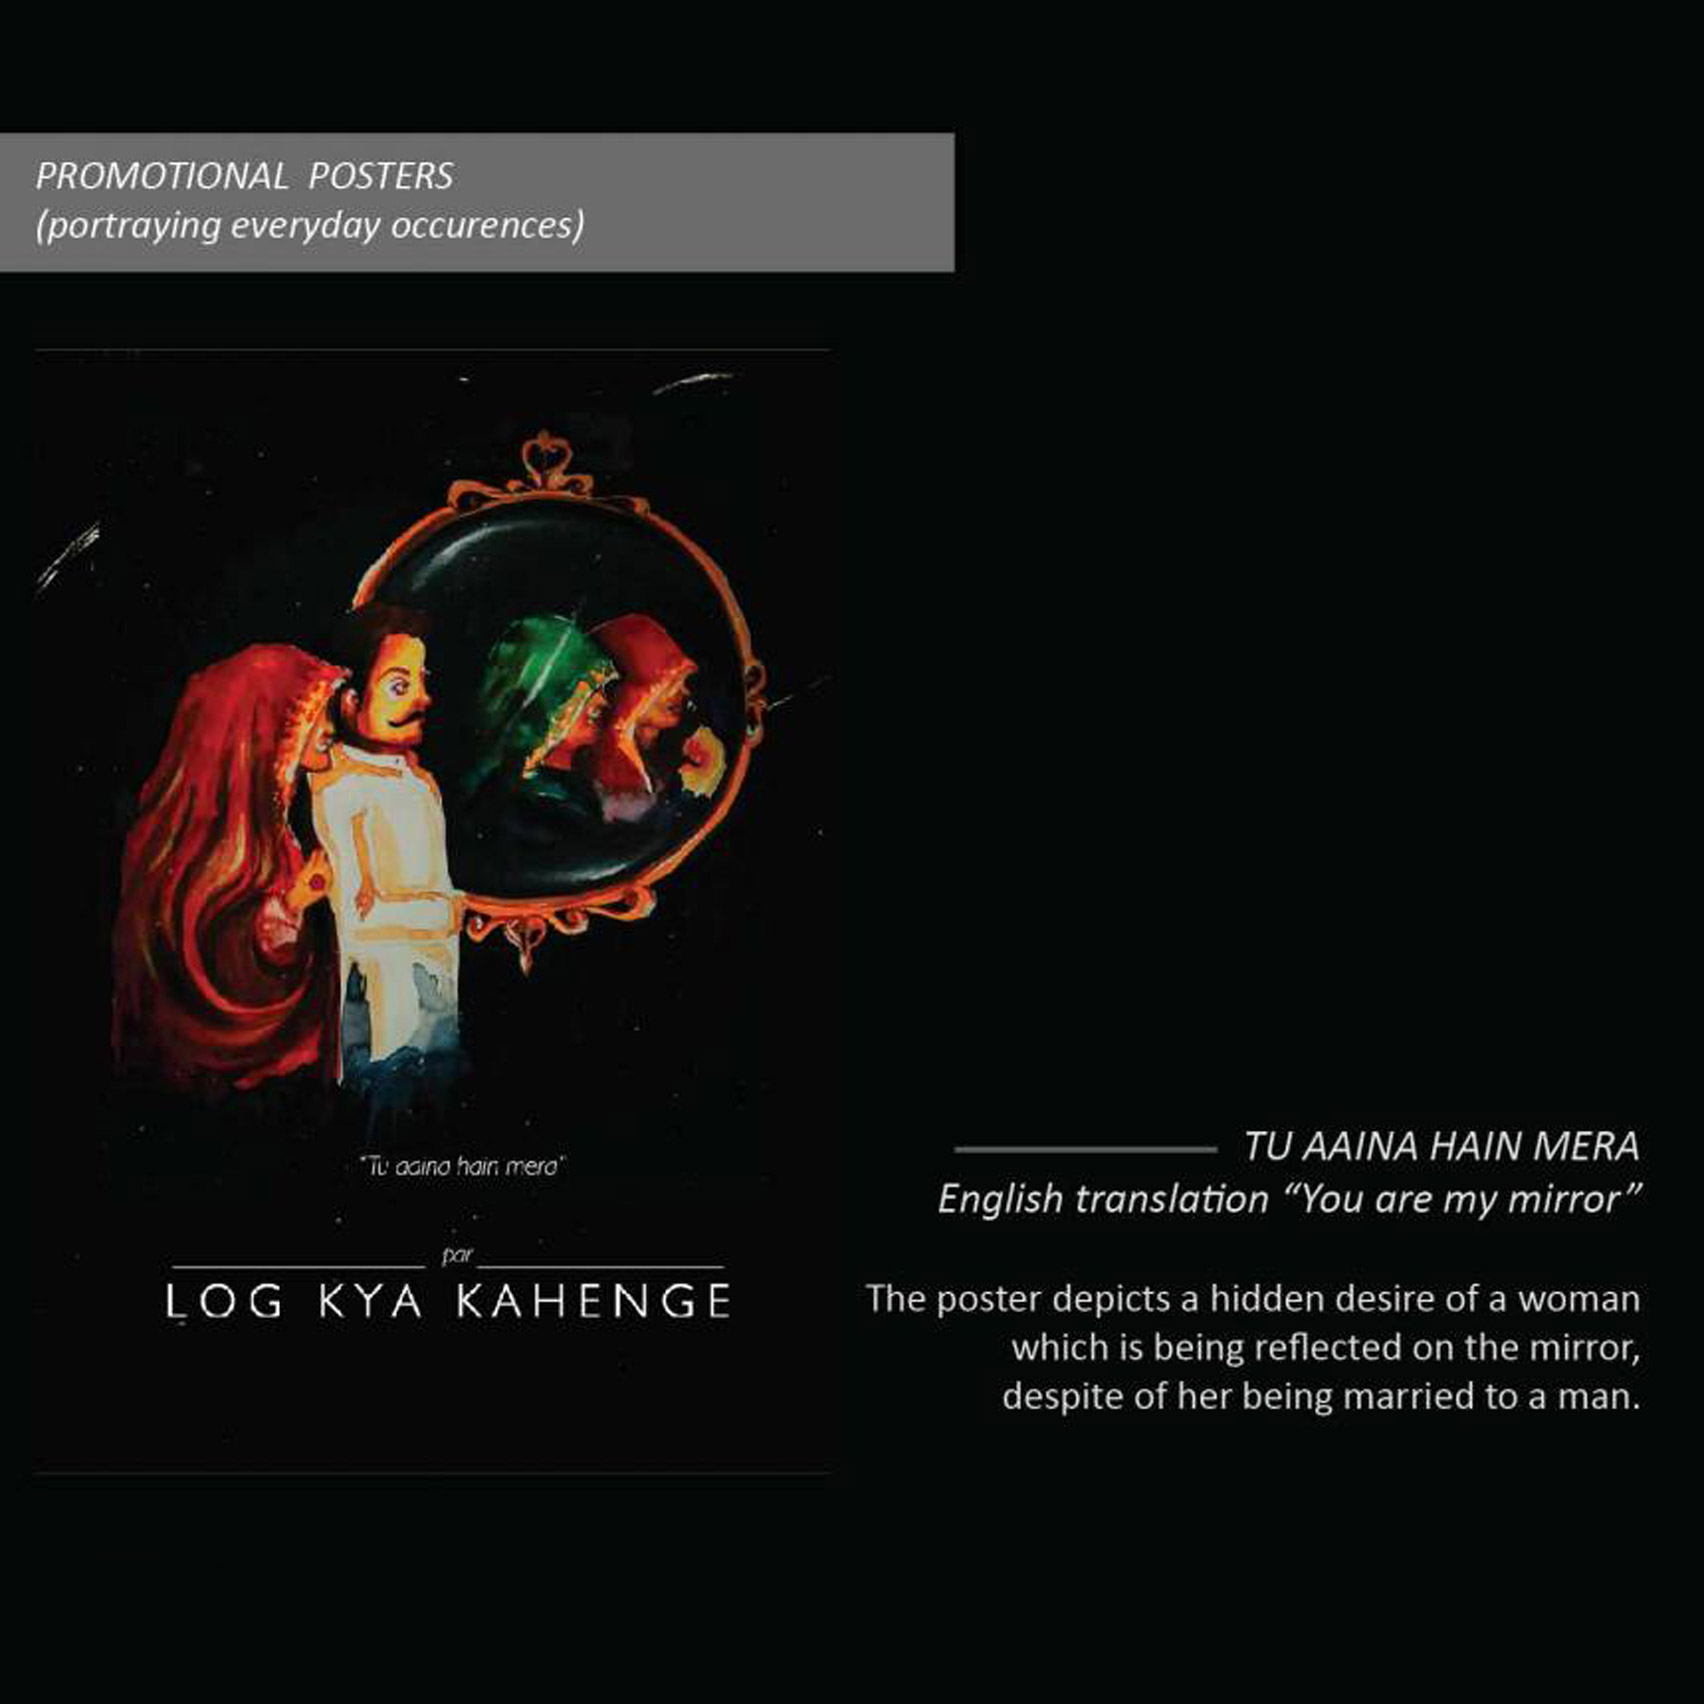 A poster from Log Kya Kahenge by Arunima Sarkar